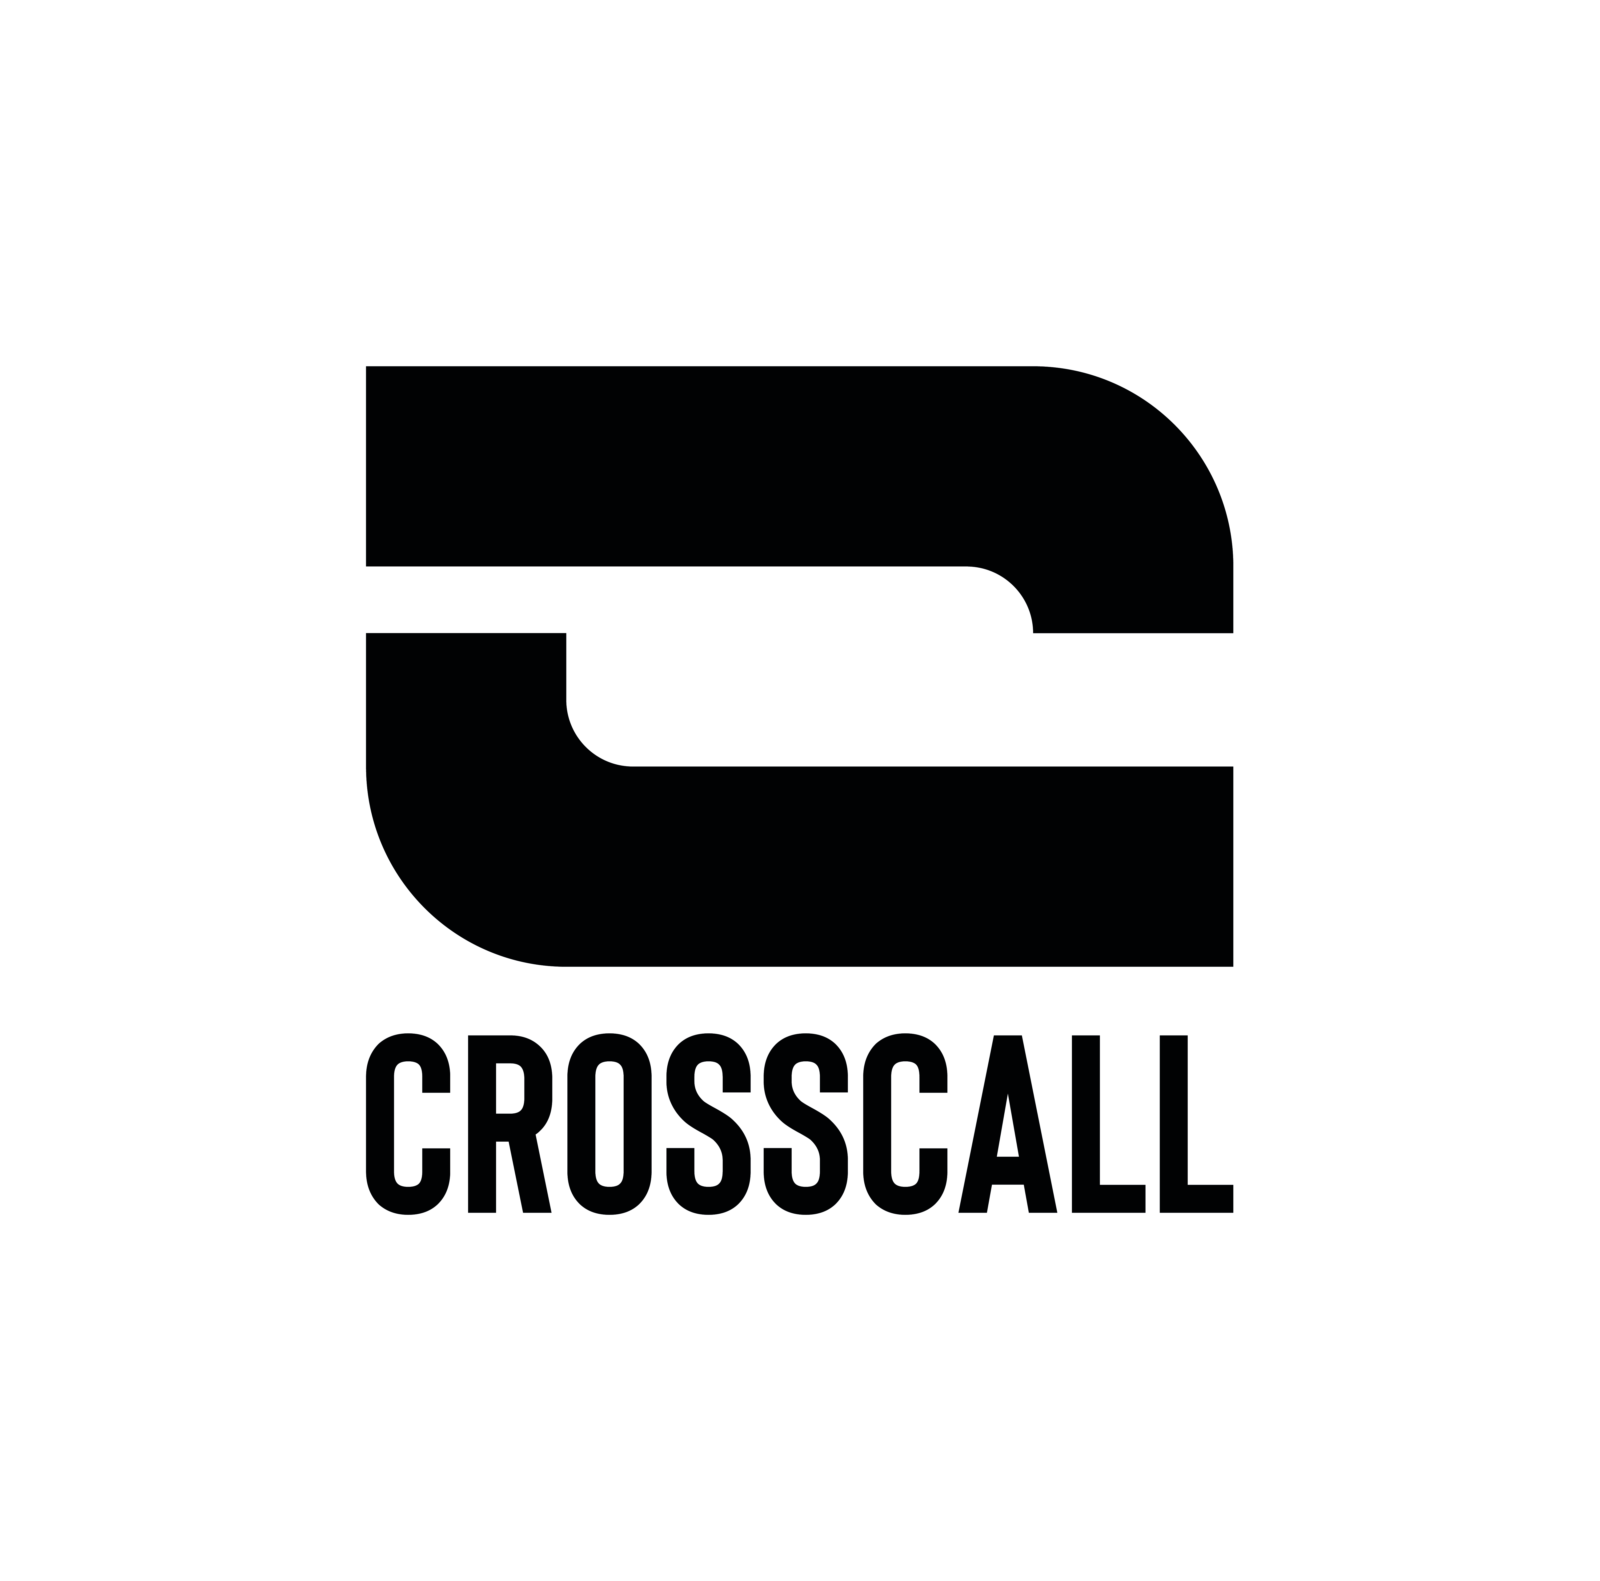 CROSSCALL_PRIMARY_BLACK_CMYK